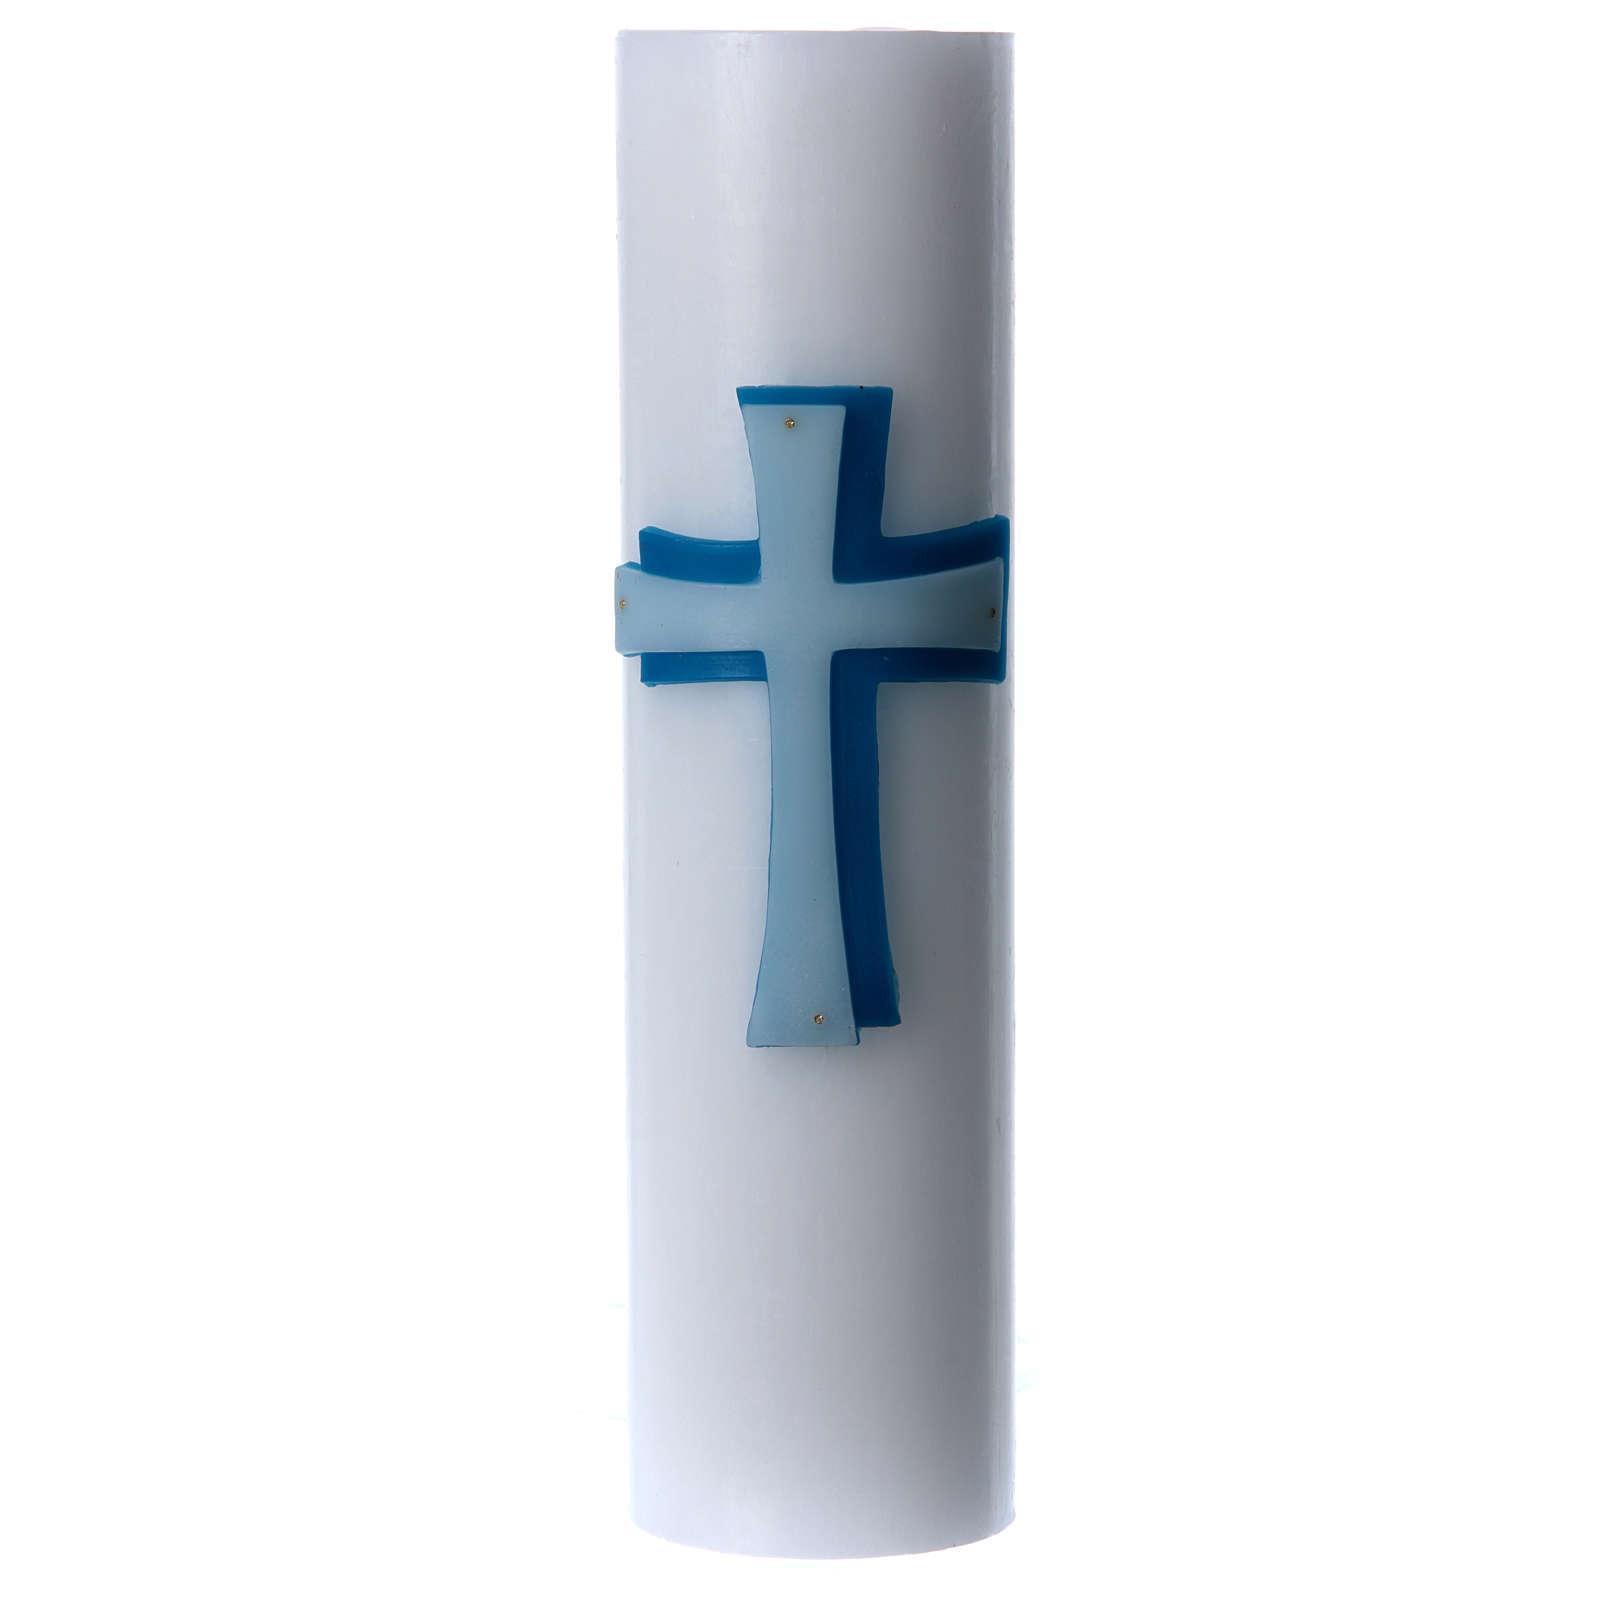 Cero da altare bassorilievo cera bianca croce diam 8 cm 3